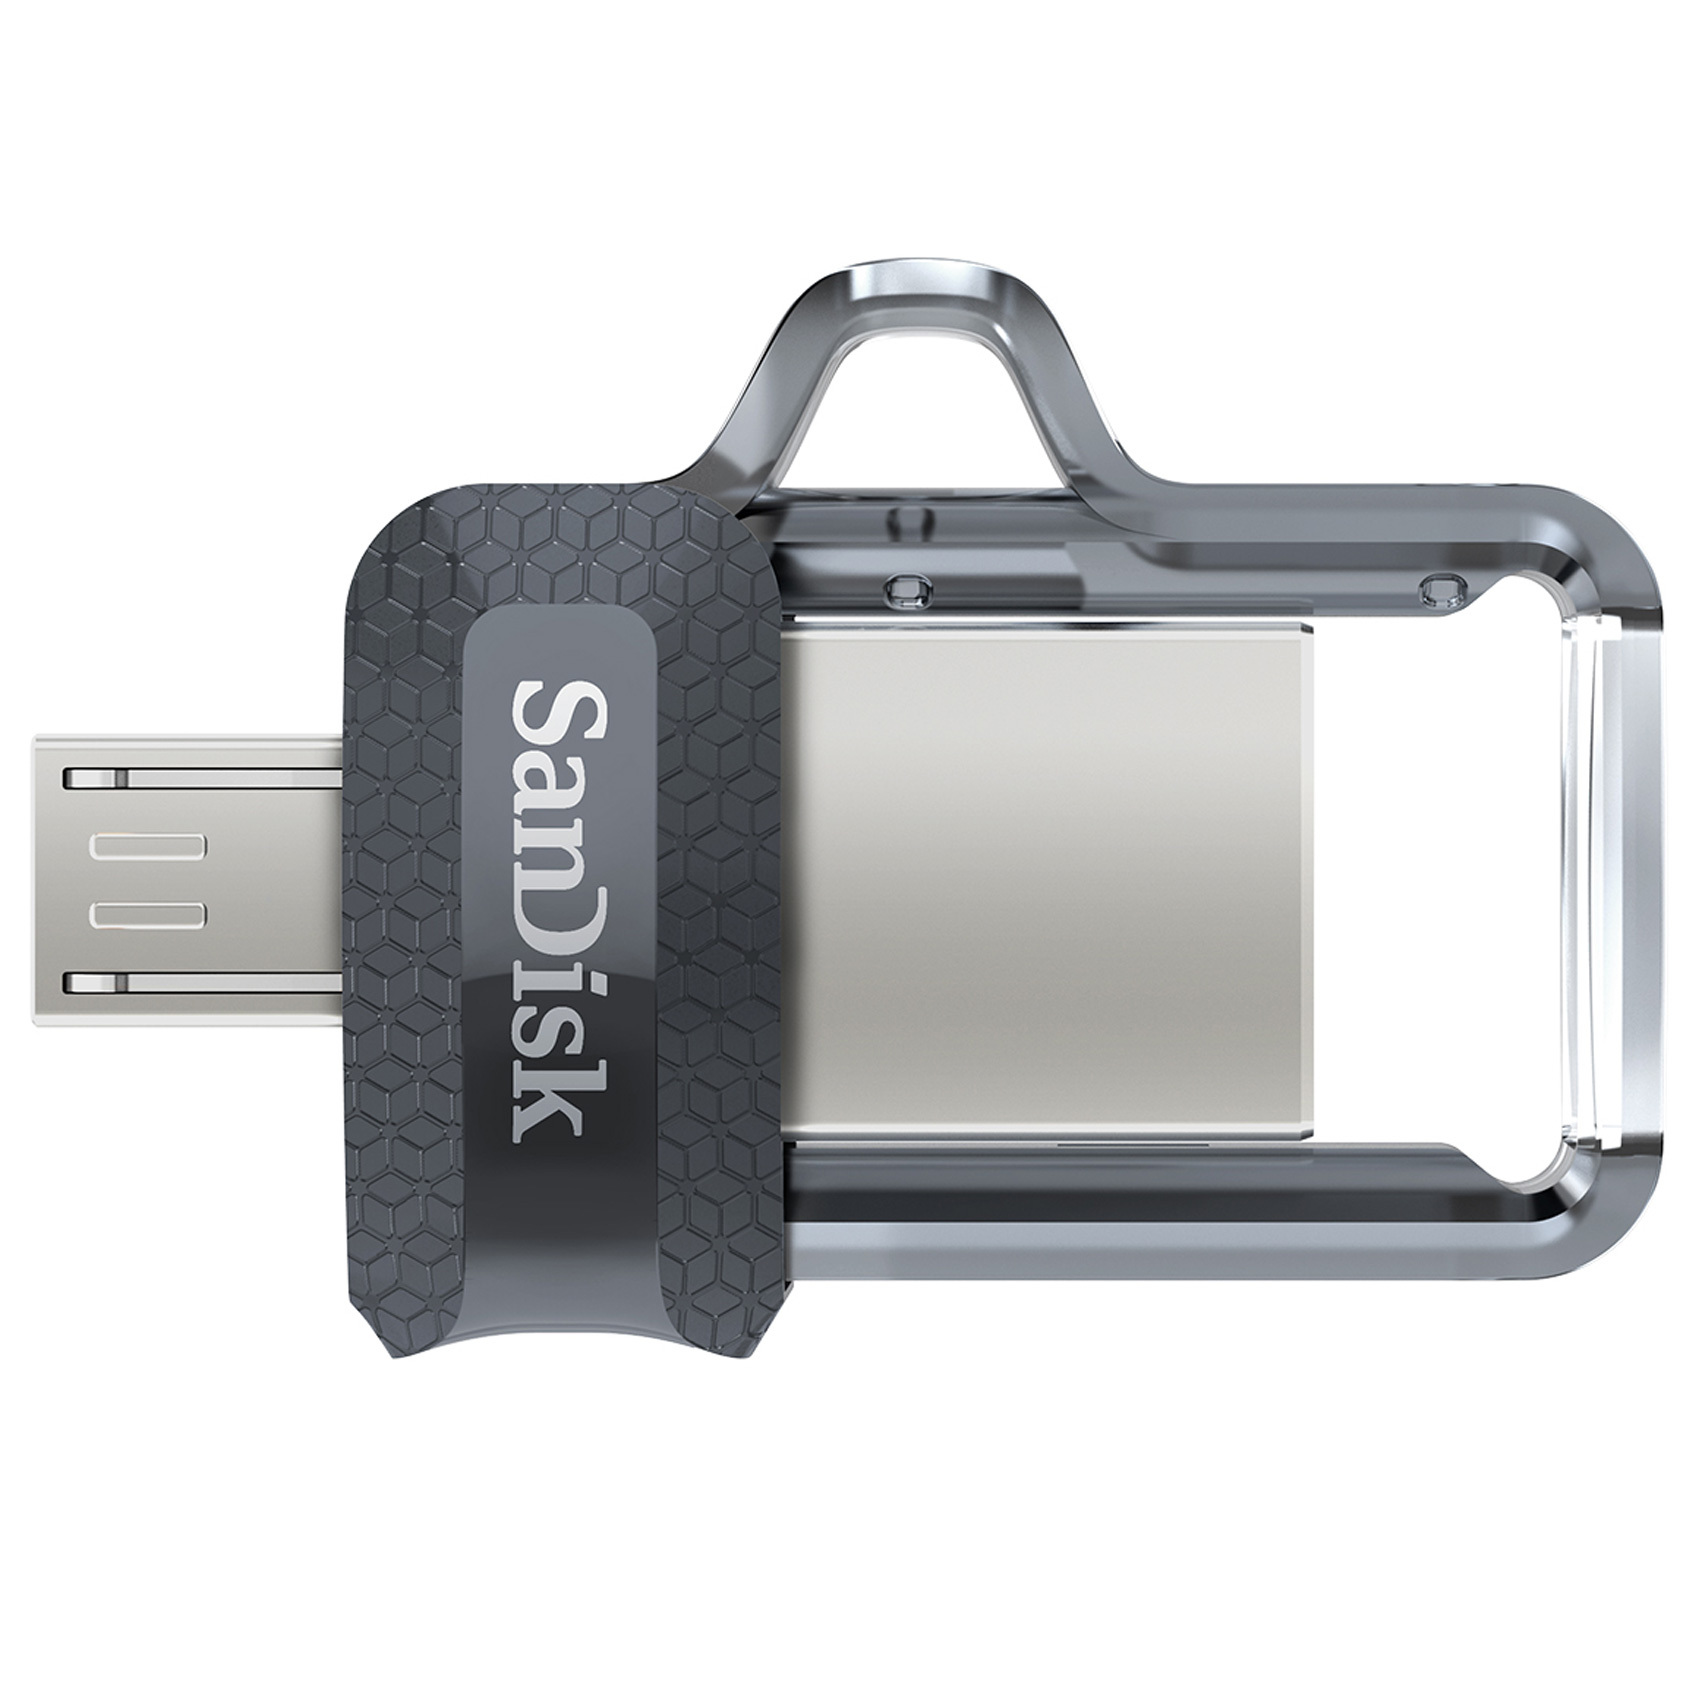 SANDISK OTG DUAL DR 32GB 3.0